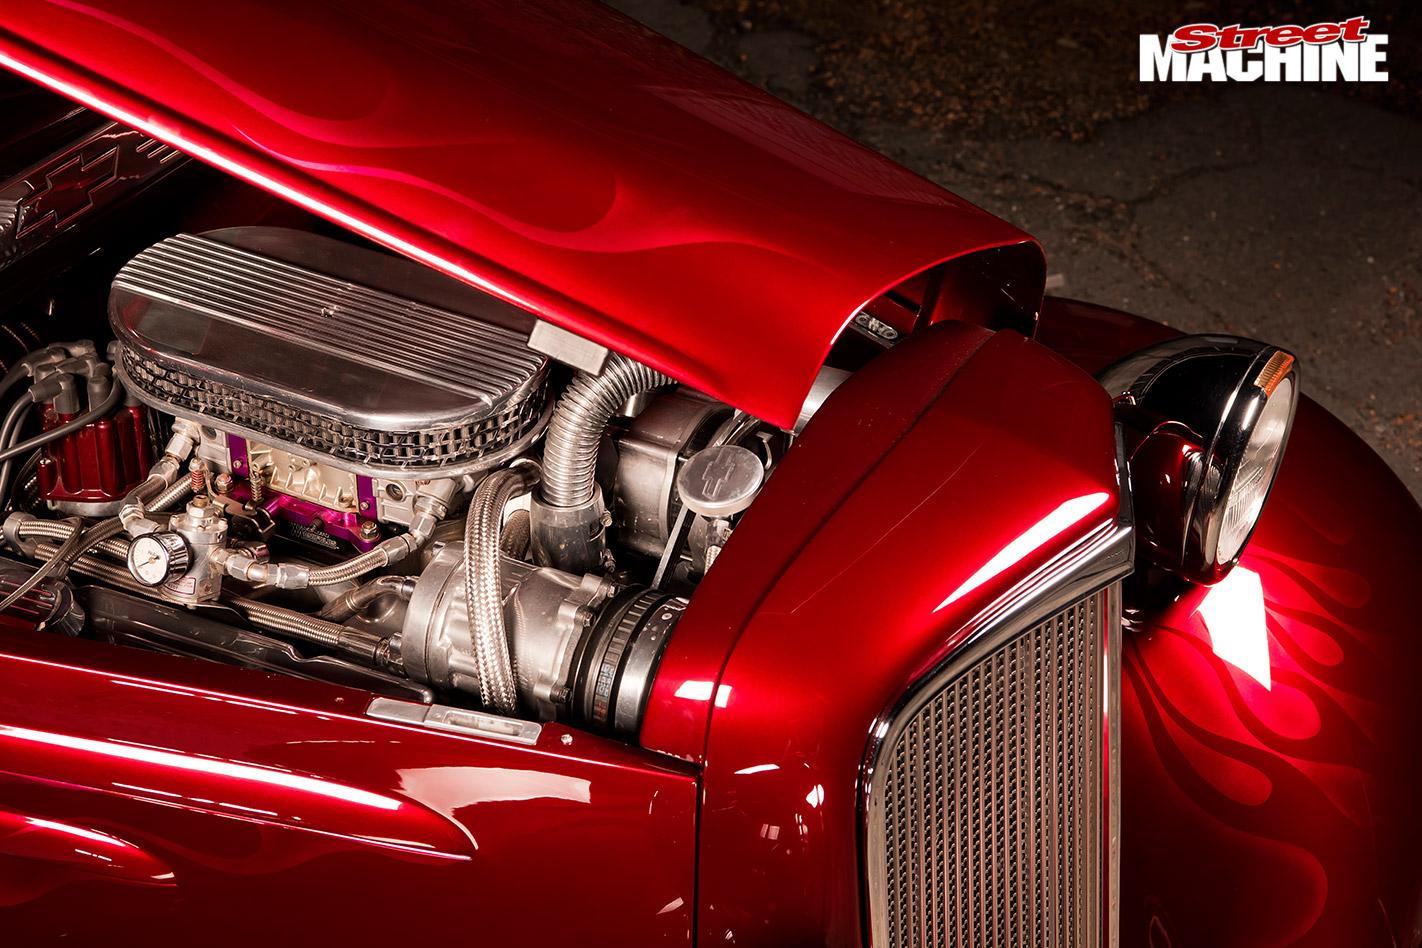 Chevy four-door sedan engine